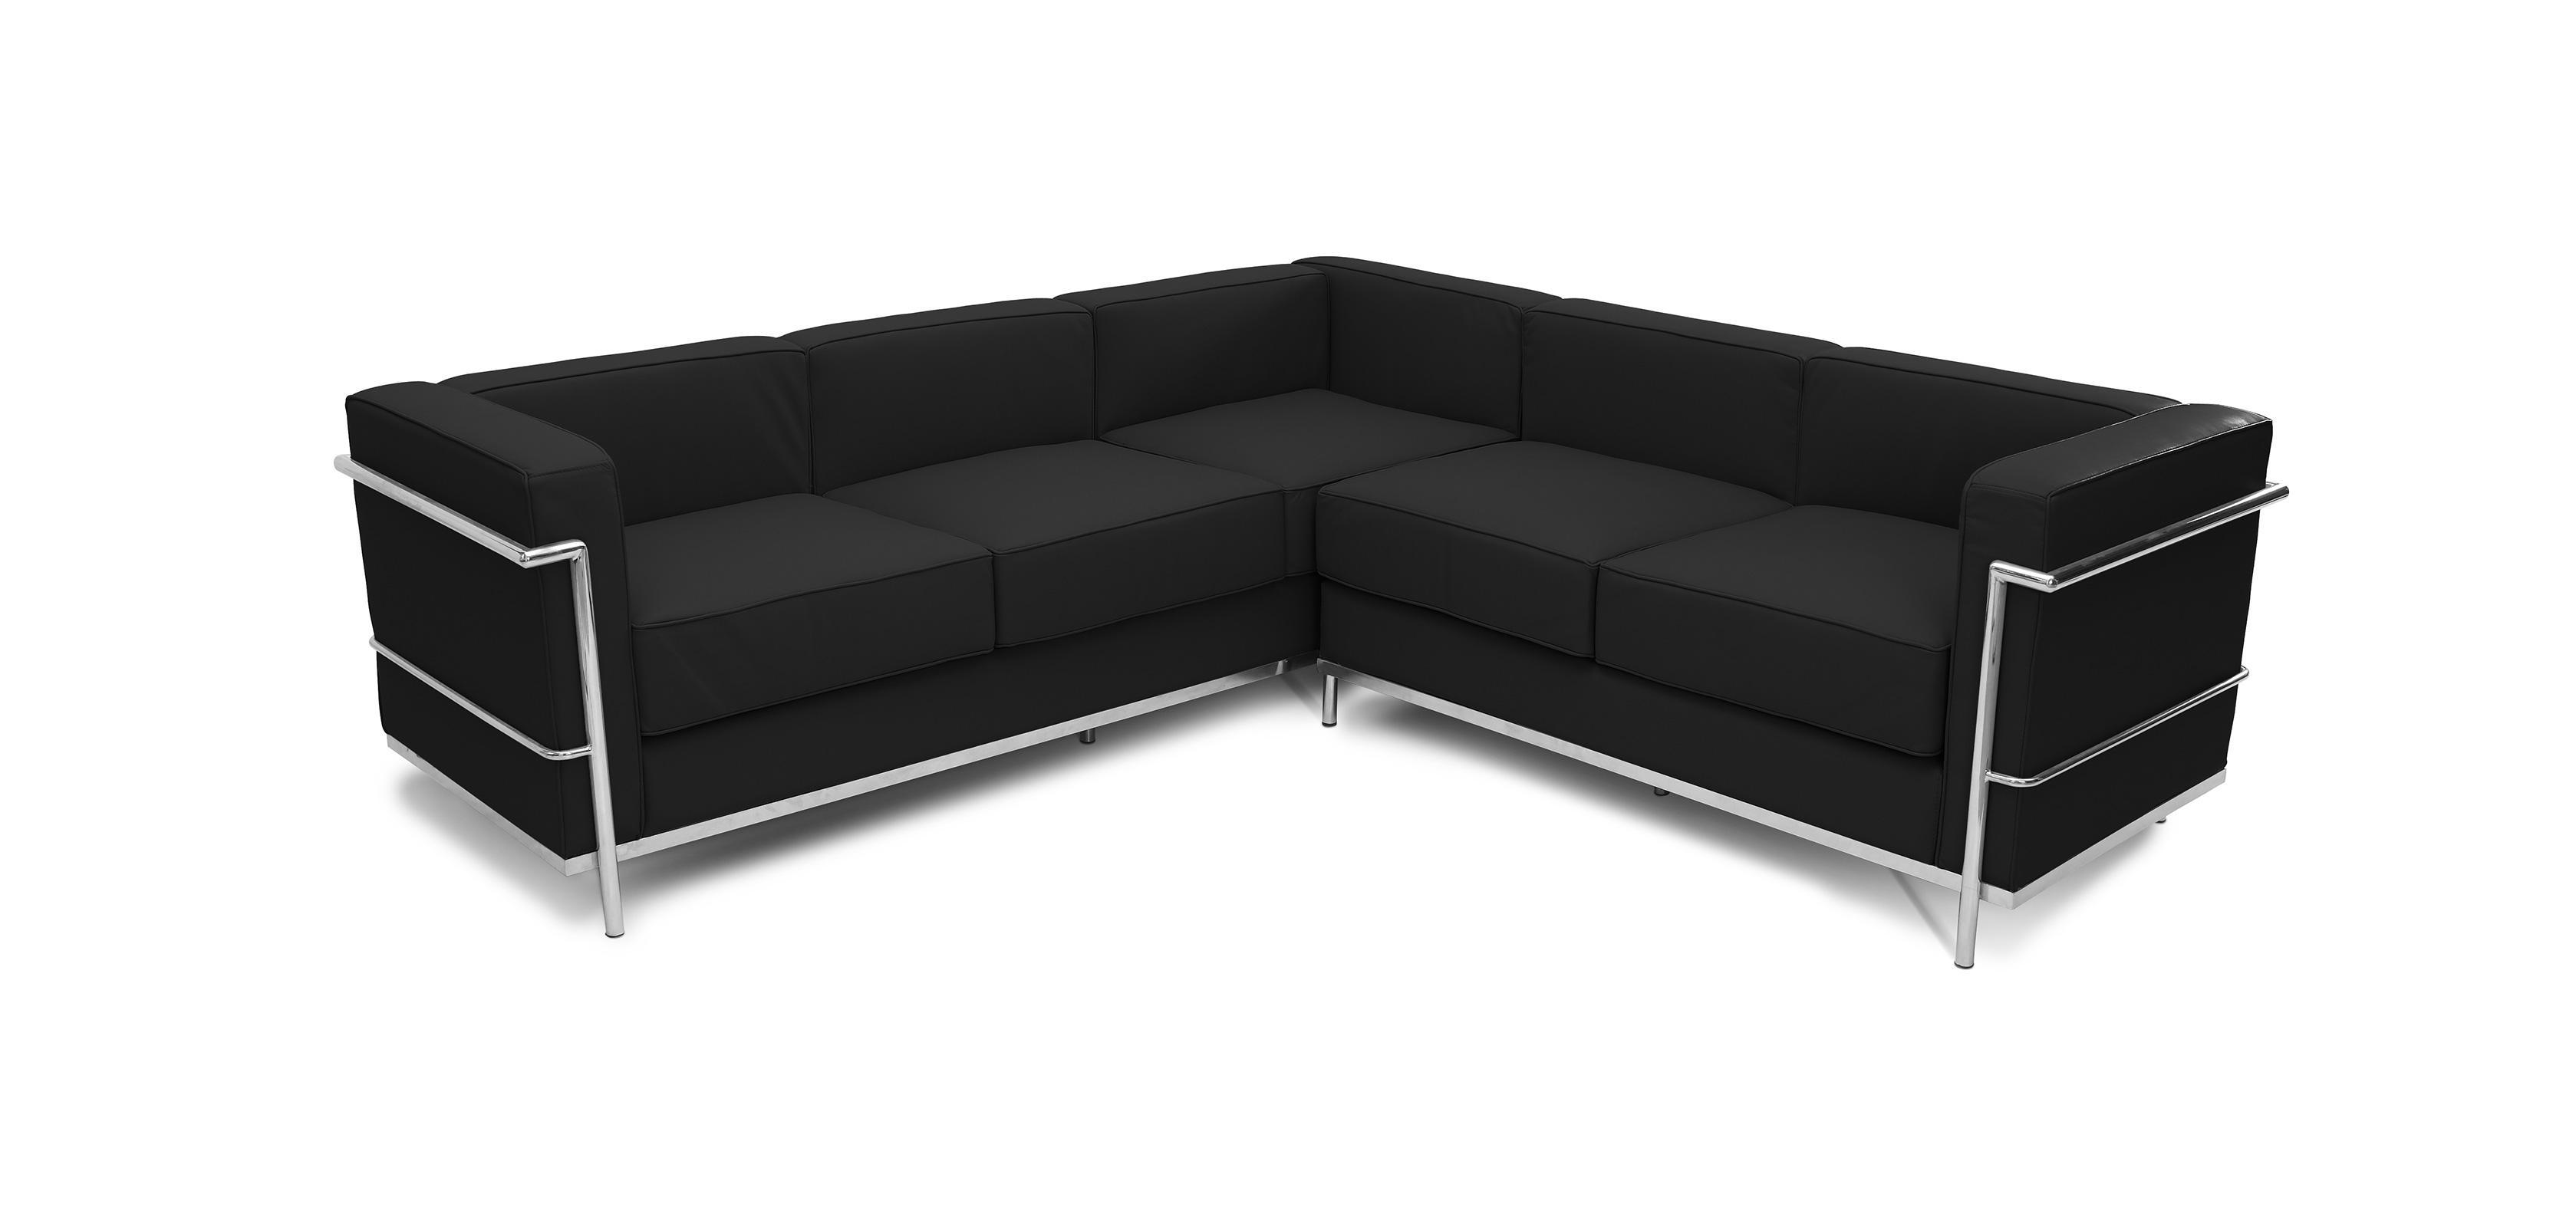 Leather Corner Sofa Designs Top Preferred Home Design With Regard To Leather Corner Sofas (Image 10 of 20)